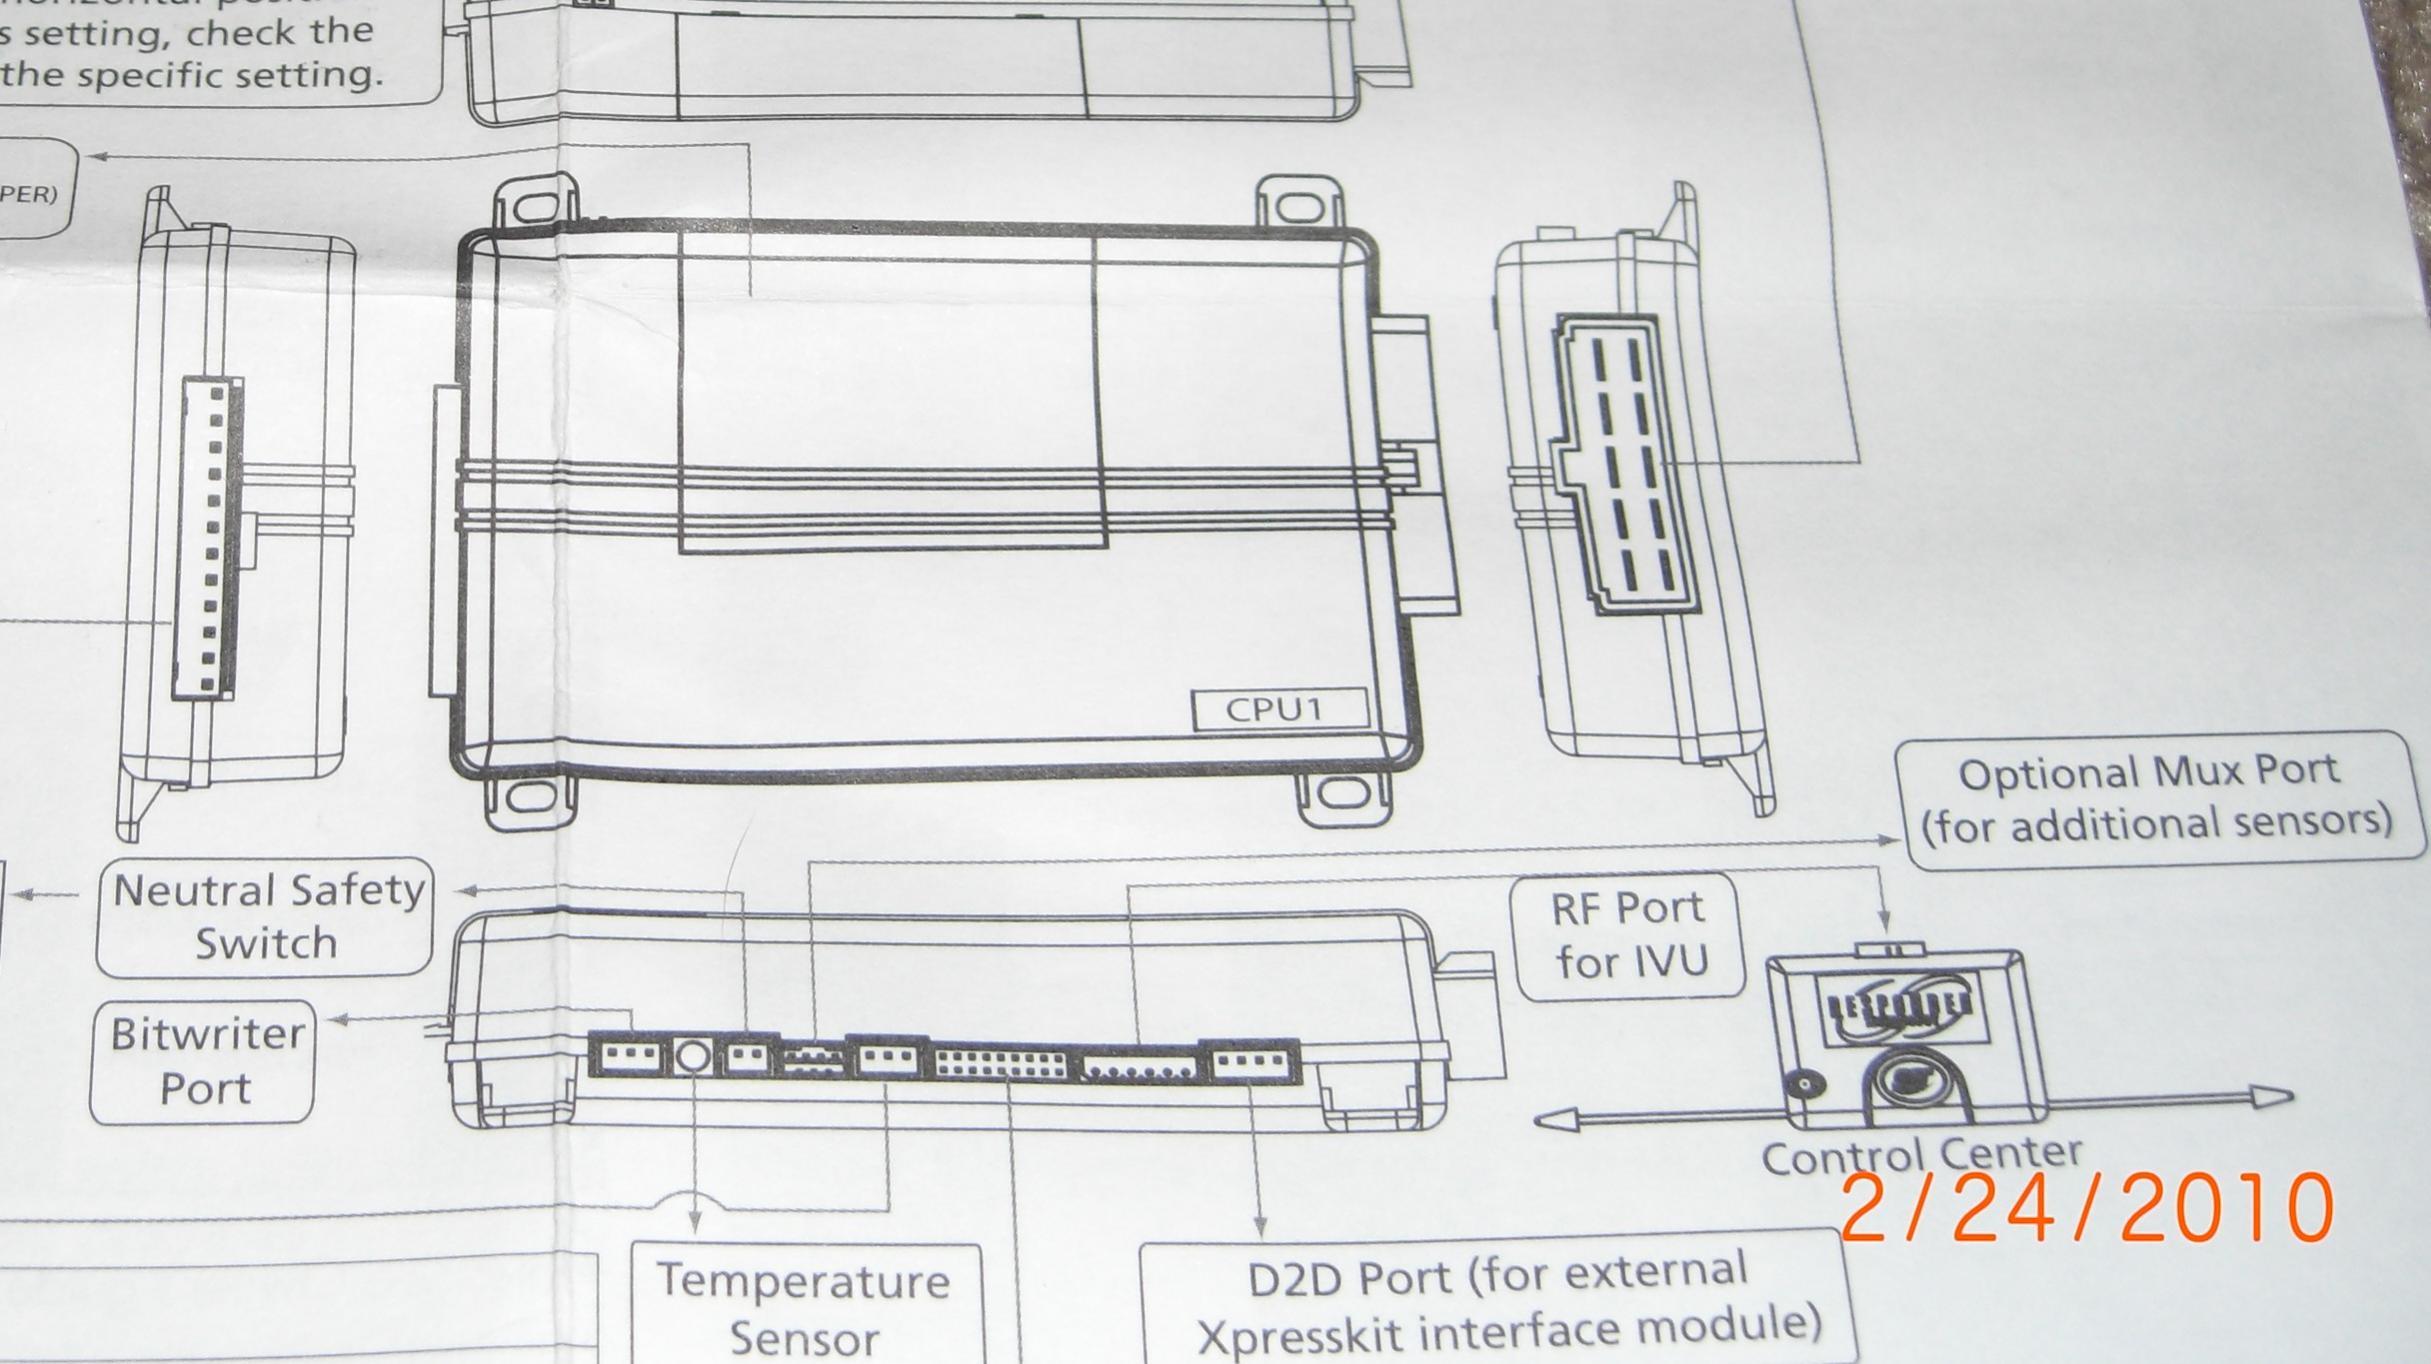 Viper 5901 Wiring Diagram:  Charger Forumsrh:chargerforums.com,Design